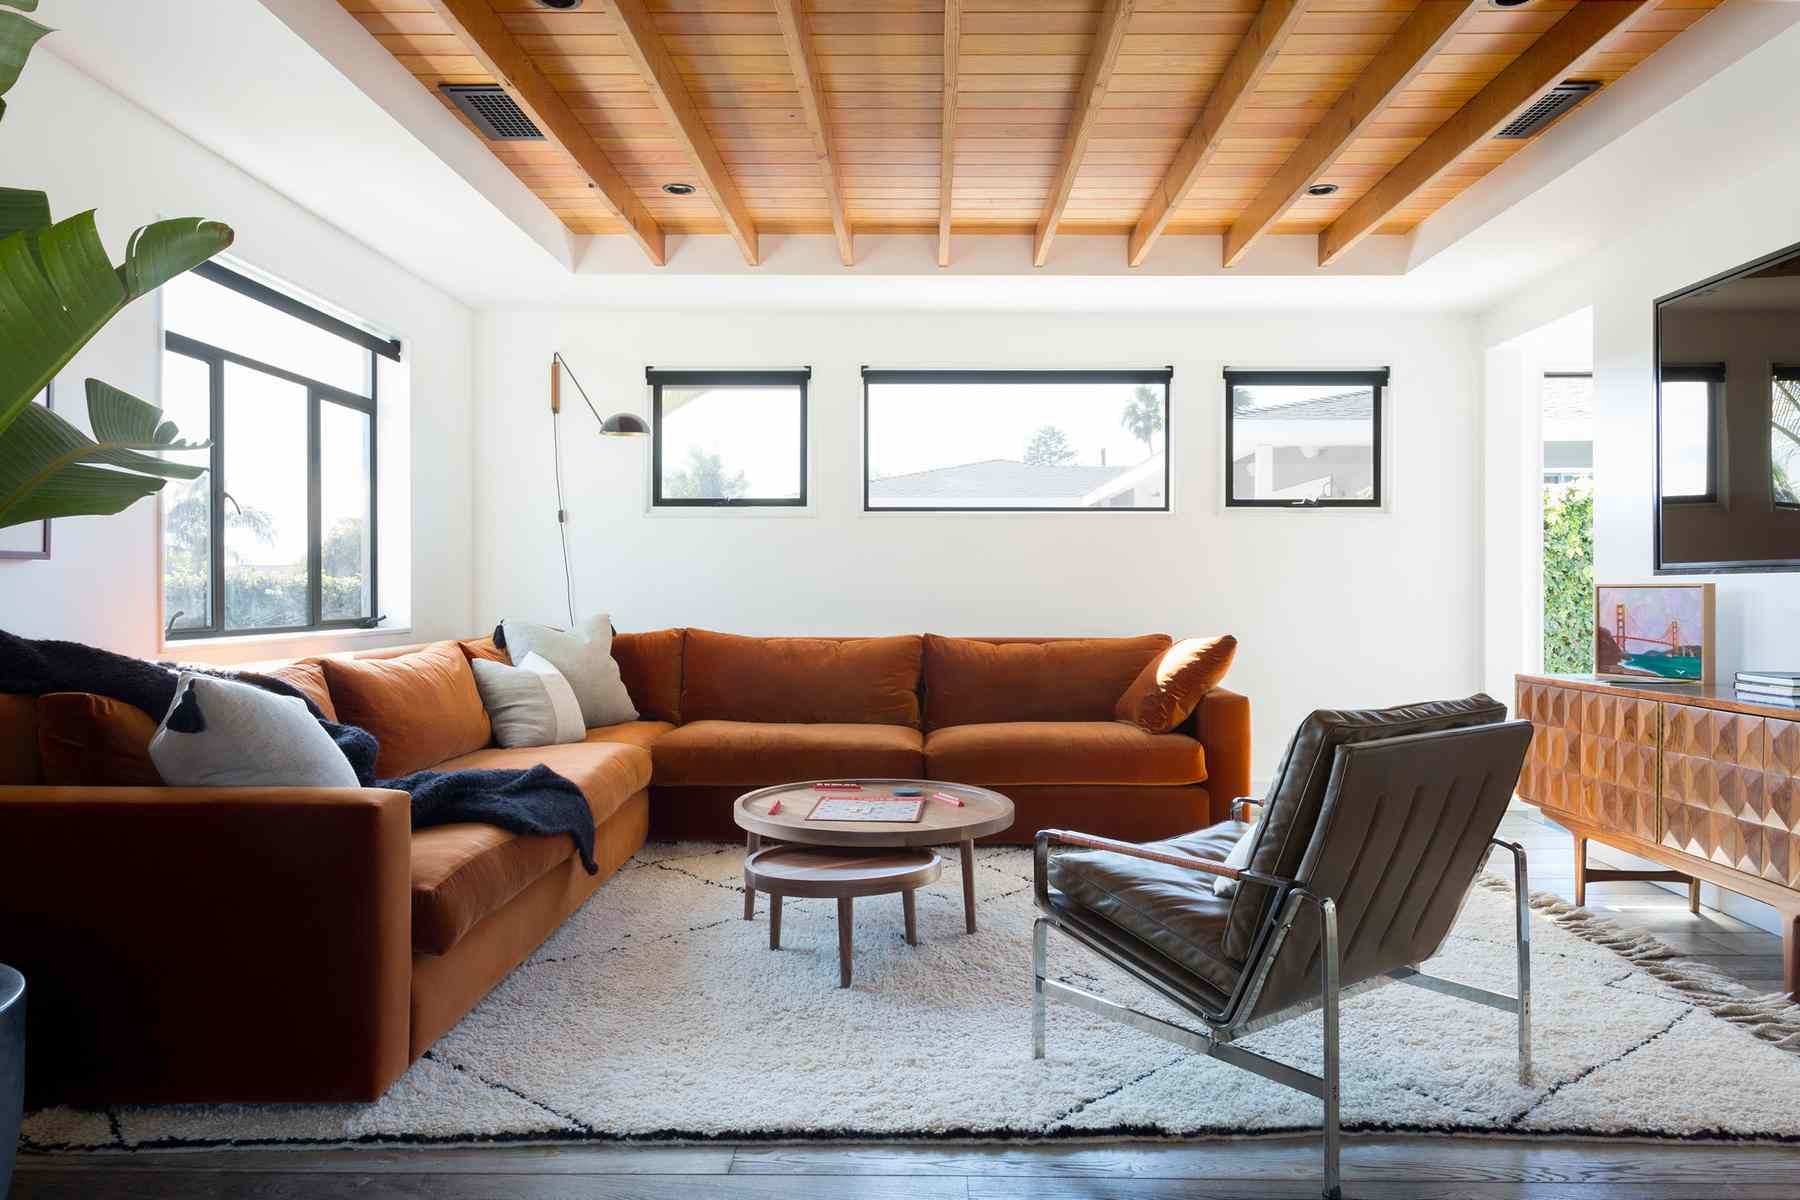 Bright yet cozy living room with an orange velvet sectional